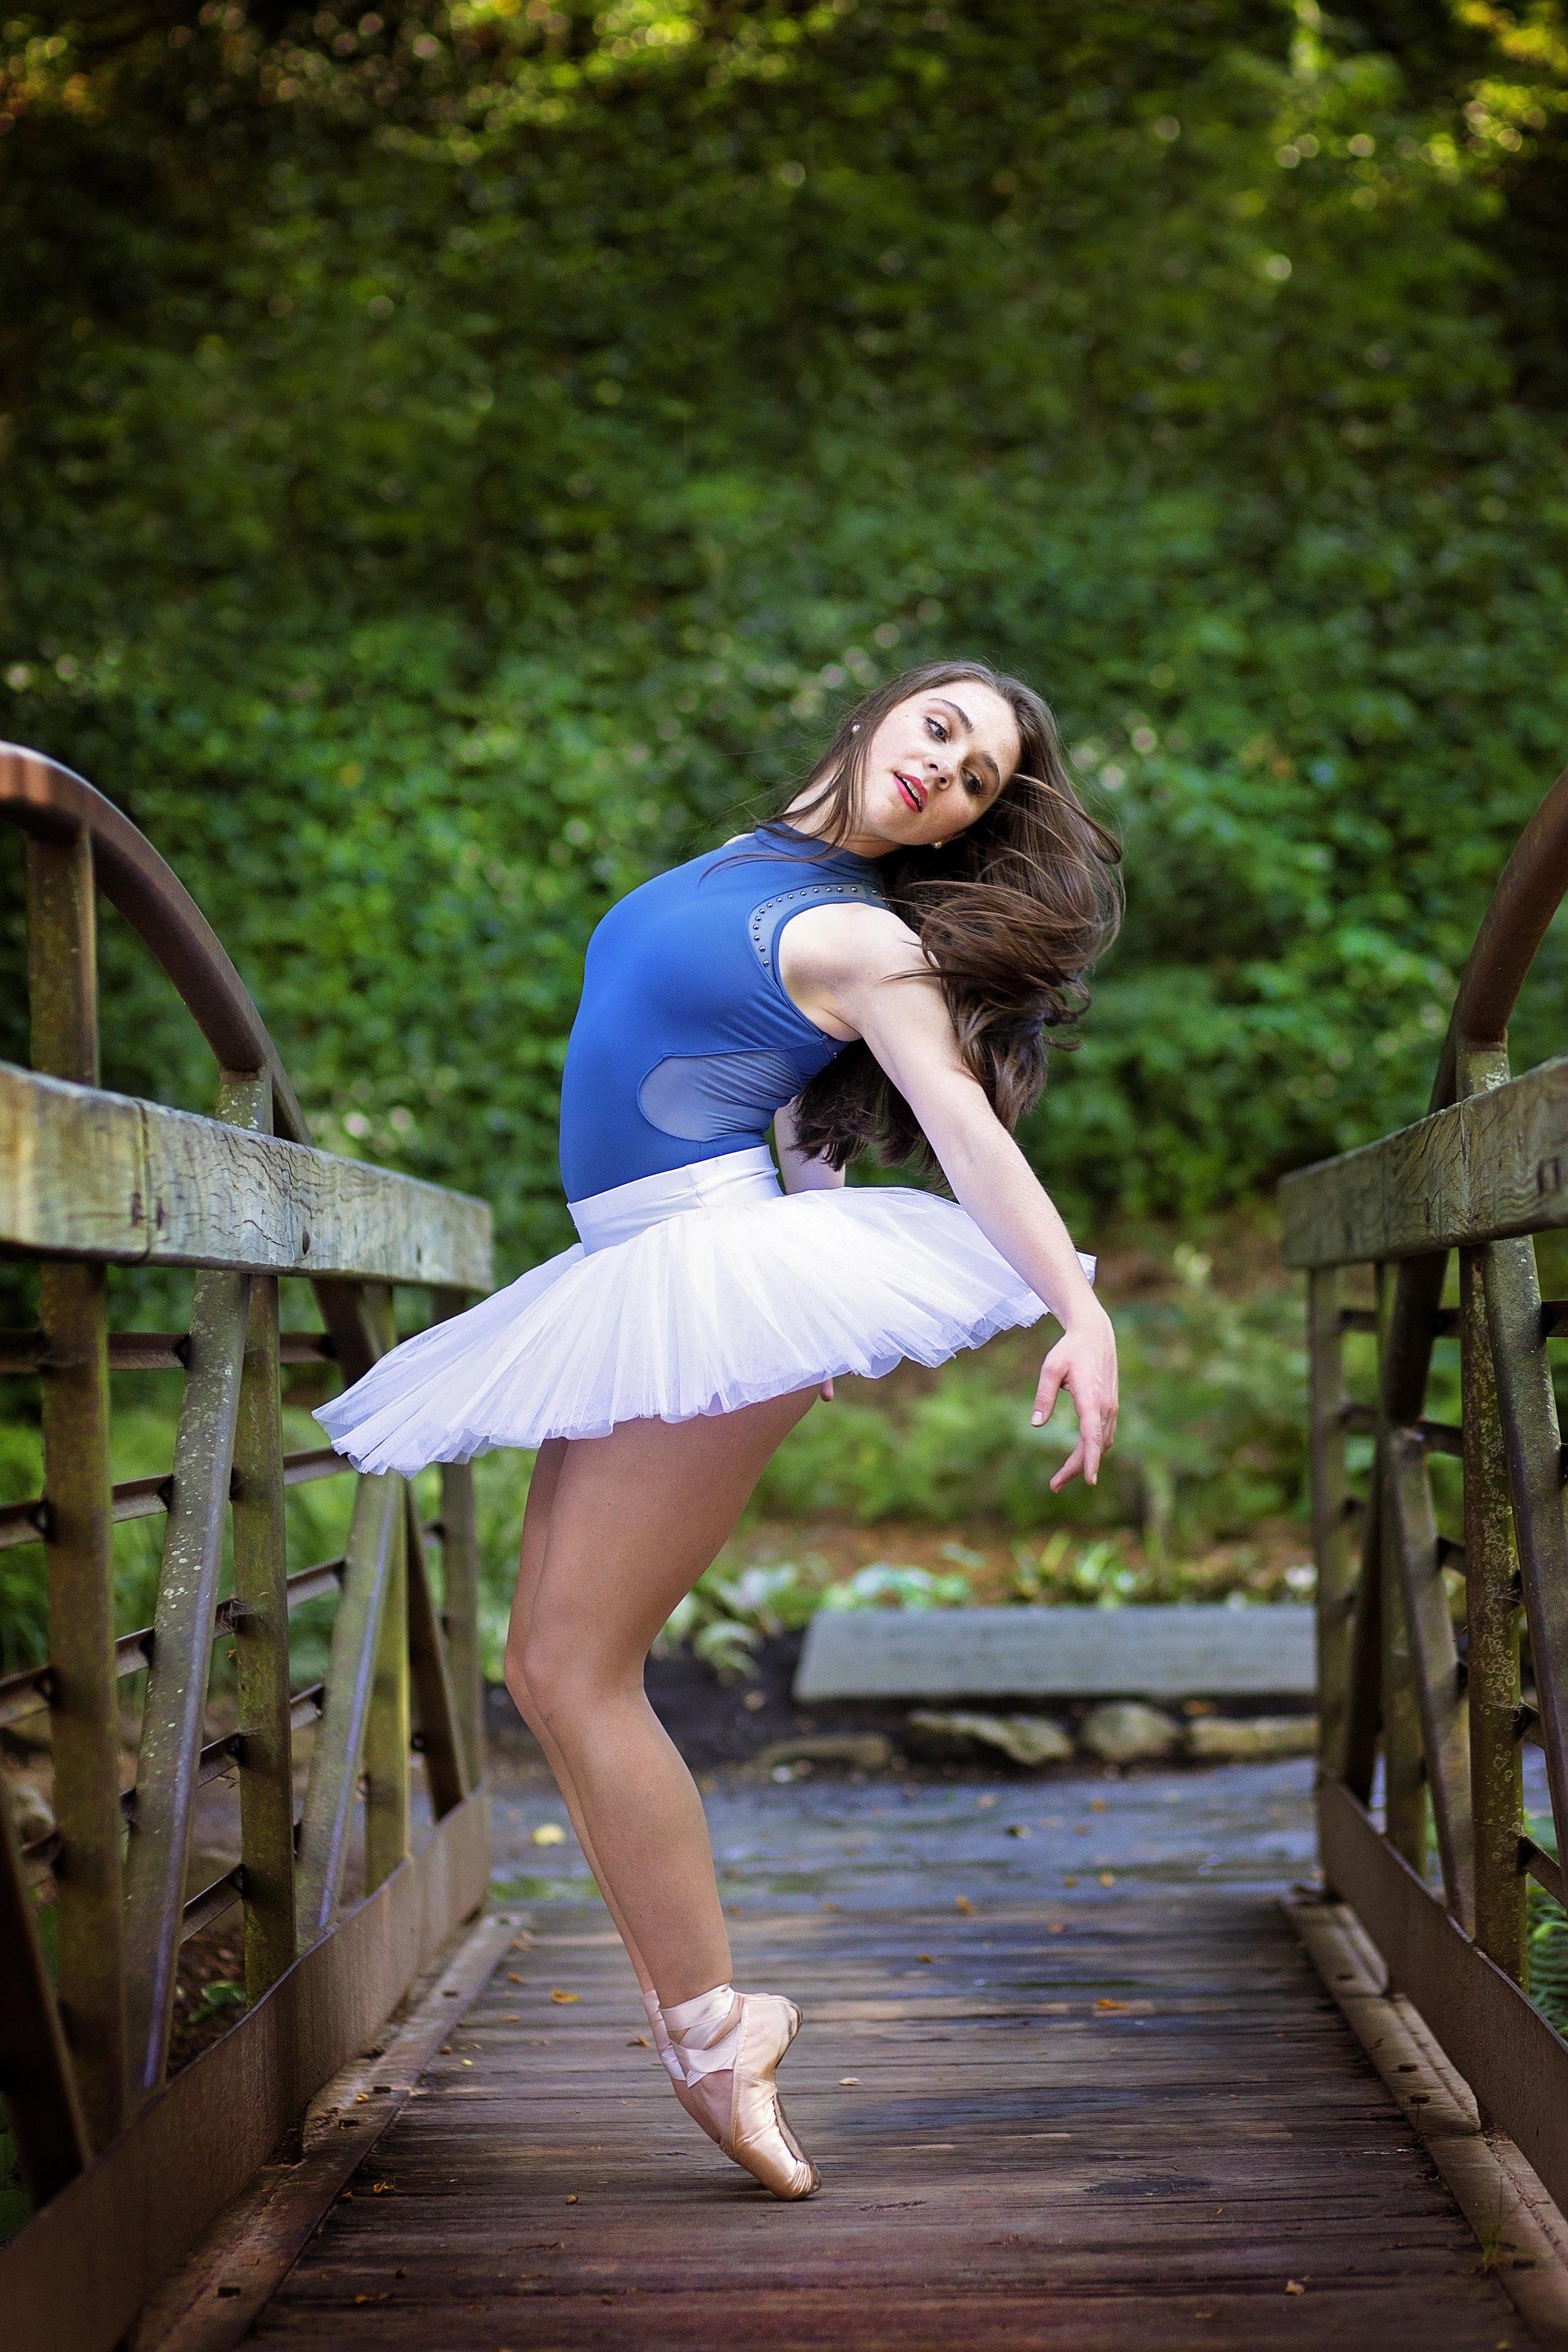 south carolina dance photographer photo portrait falls park